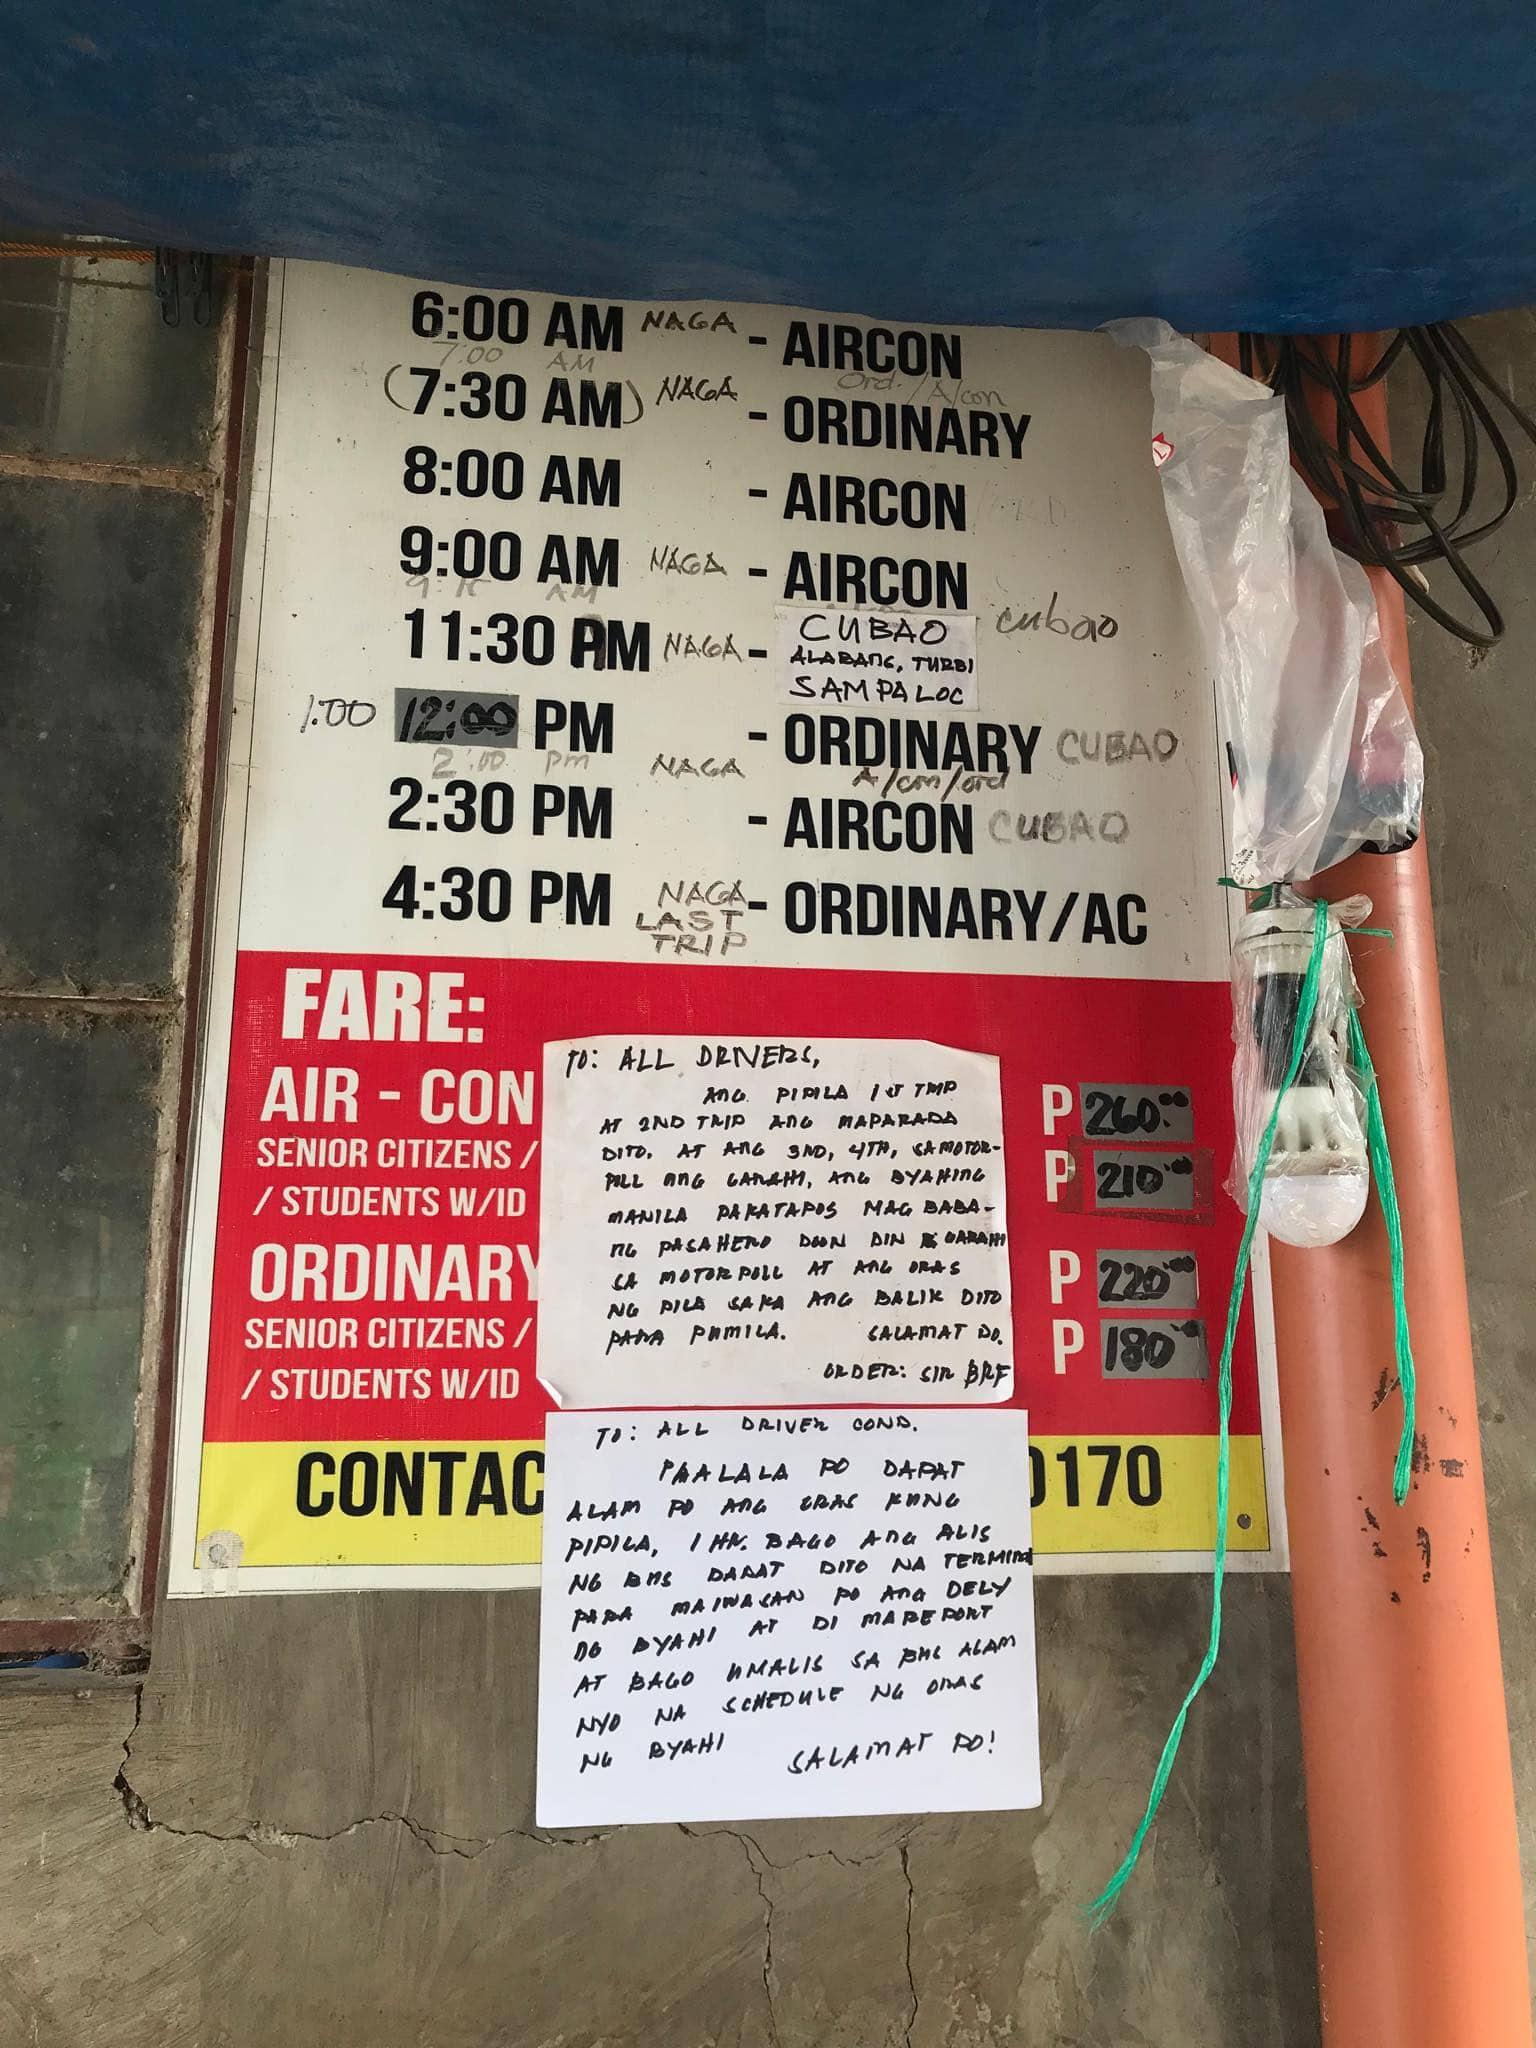 Caramoan to Naga schedule buses, Naga to Caramoan, Caramoan to Manila schedule buses